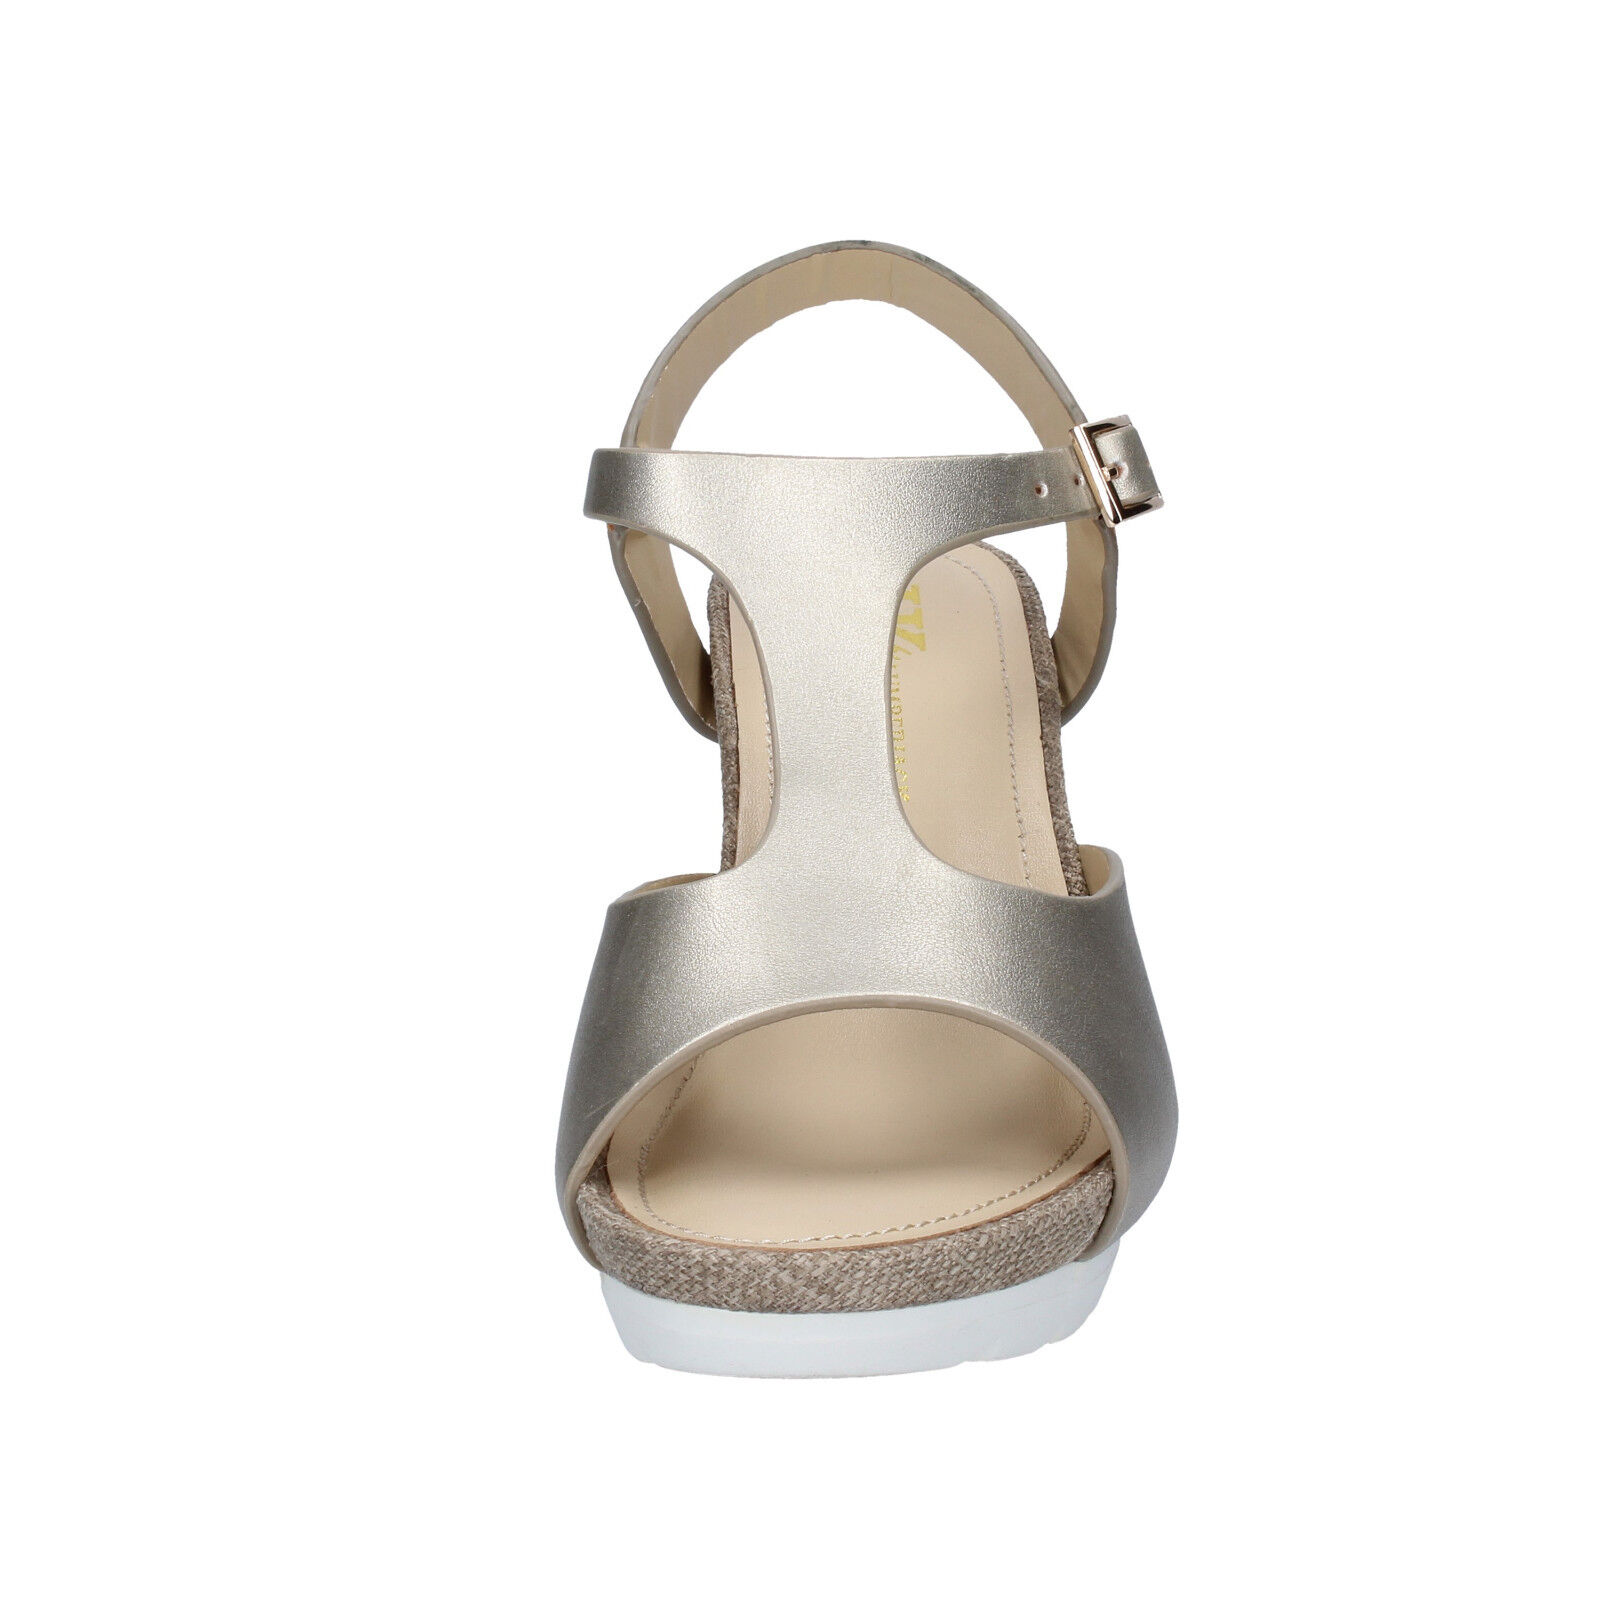 Scarpe donna LUMBERJACK 36 EU pelle sandali platino pelle EU sintetica BY49-B 4130f8